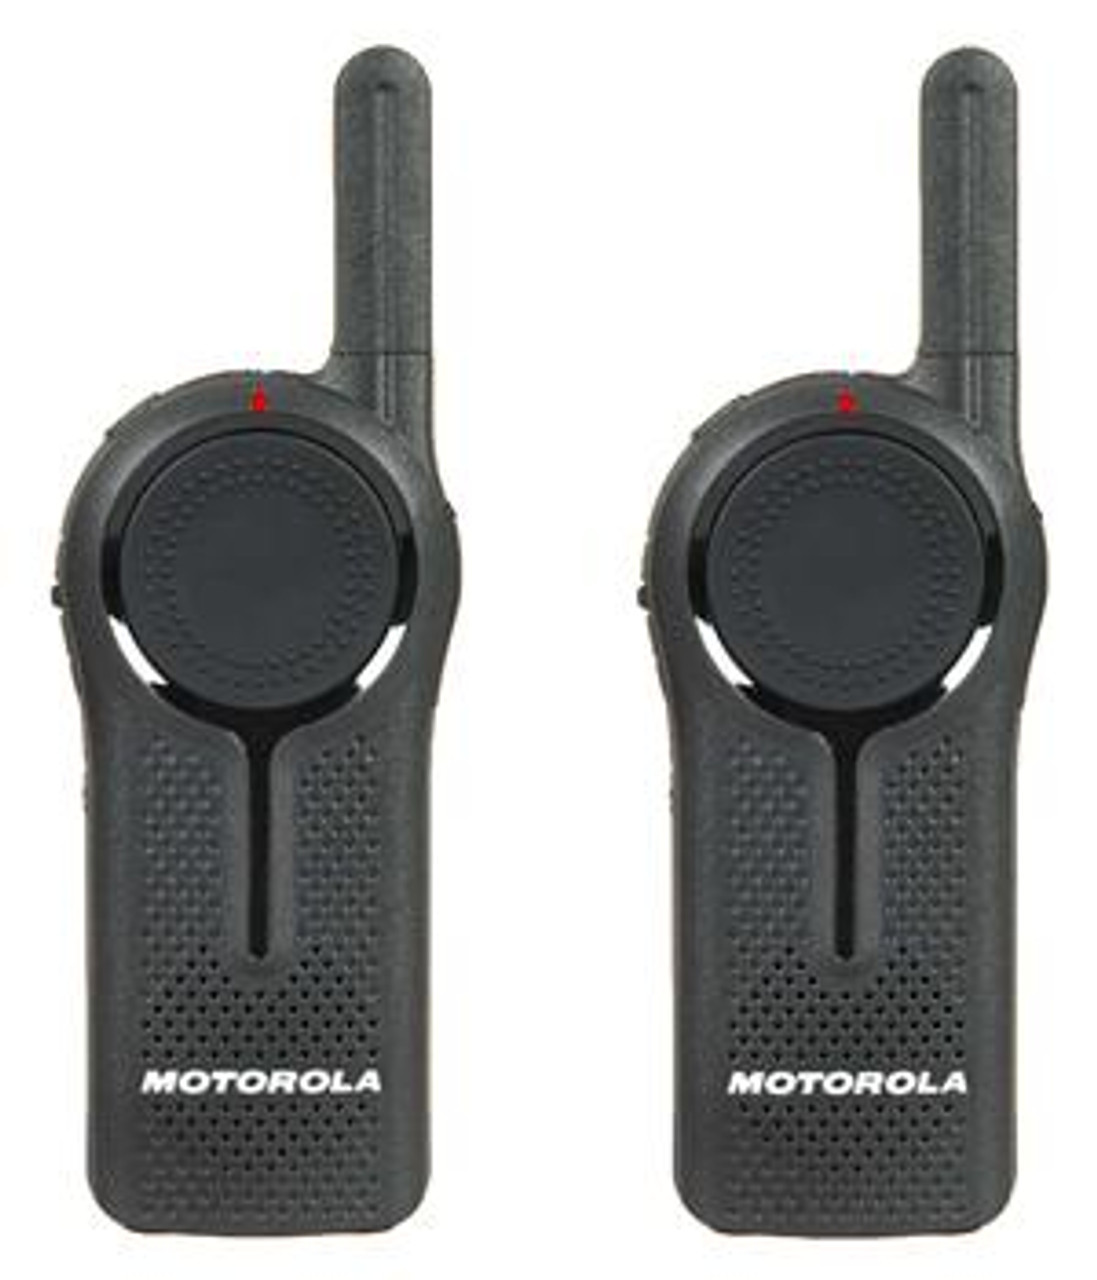 Motorola DLR1060 Digital 2 Way Radio, Pack of 2